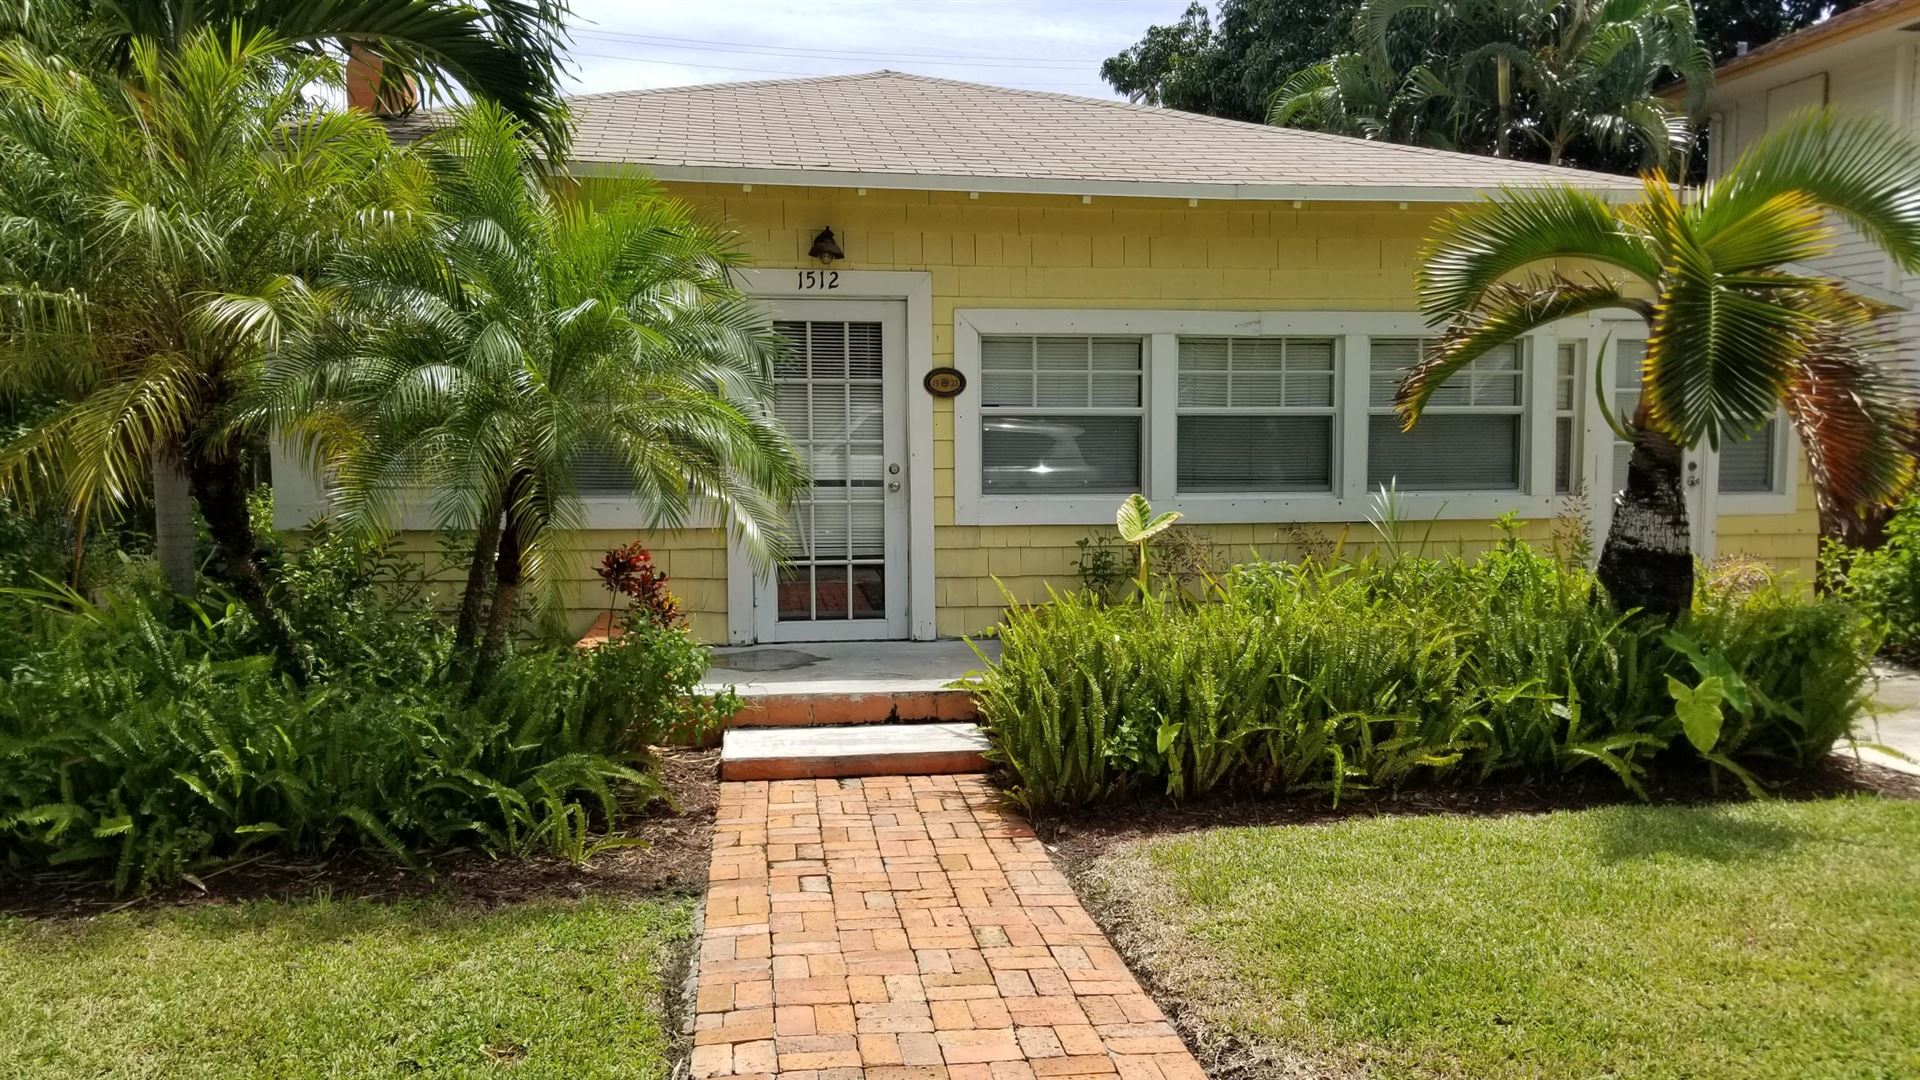 Photo of 1512 Florida Avenue, West Palm Beach, FL 33401 (MLS # RX-10715456)